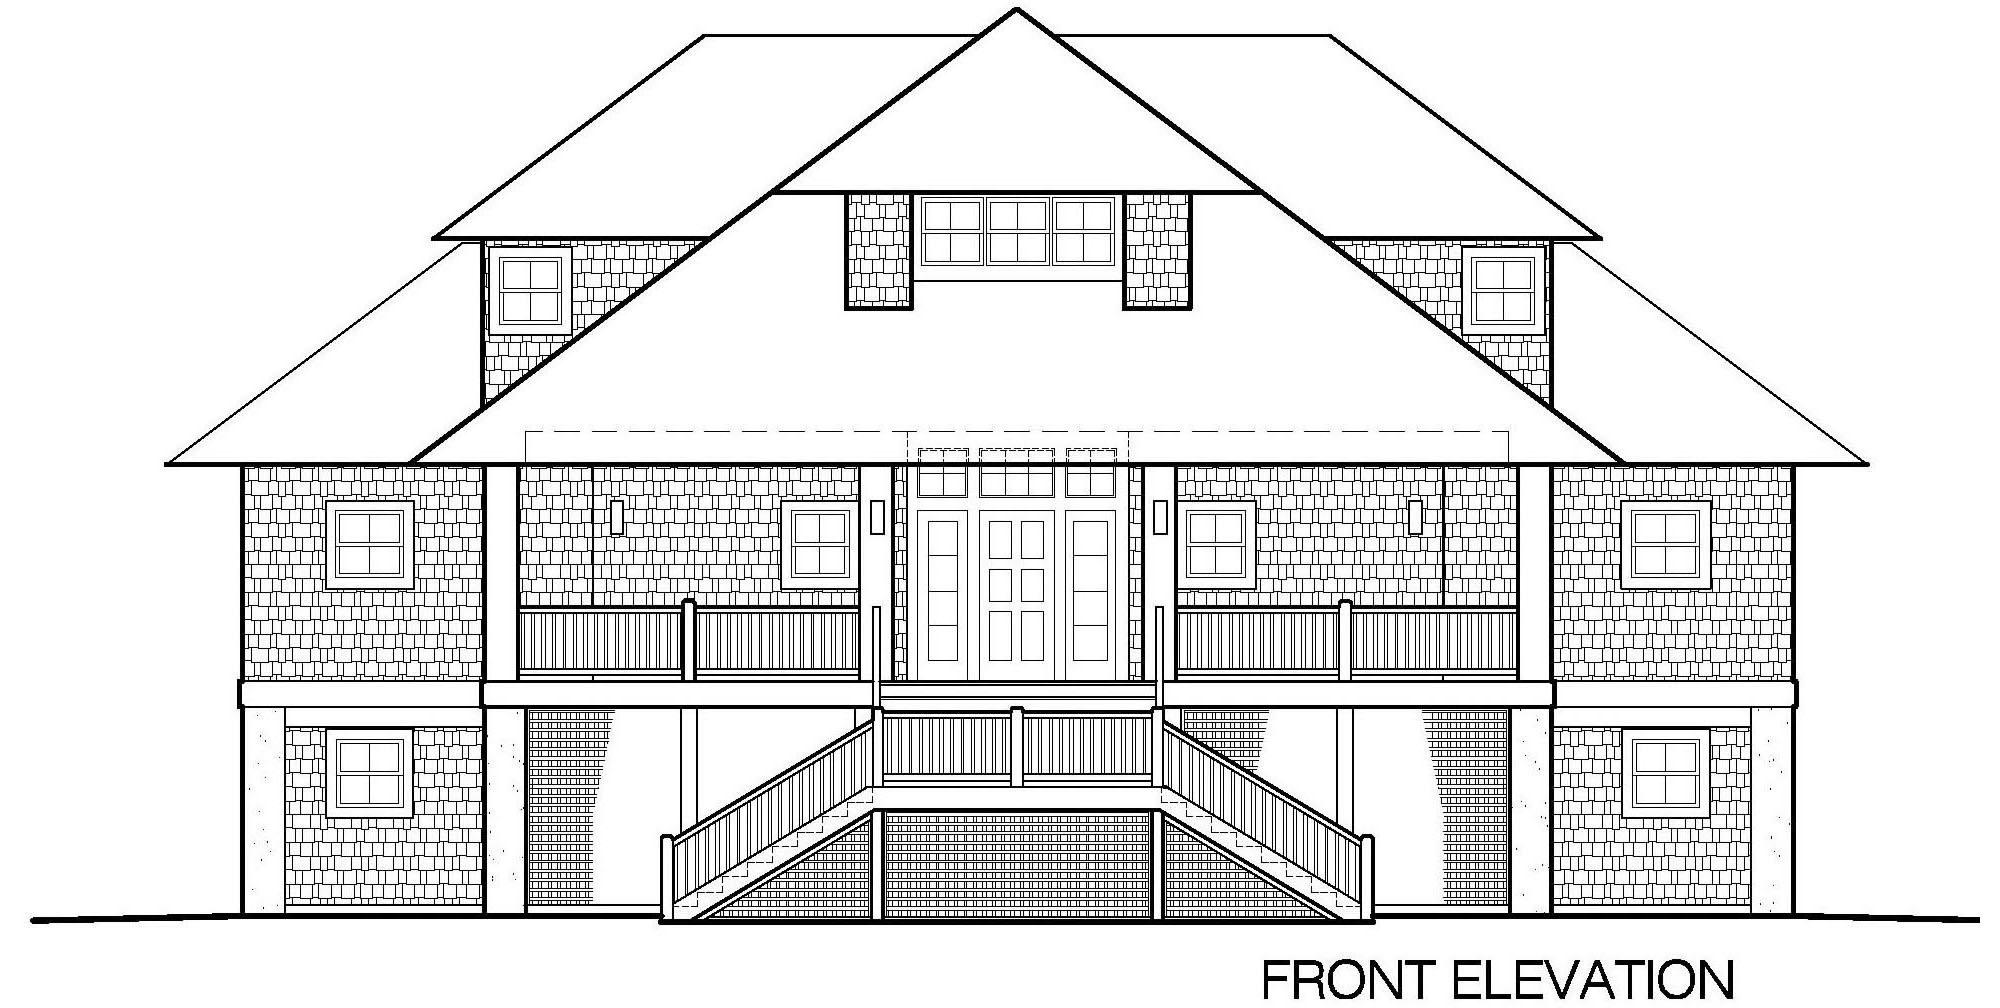 Unique Front Elevation : Unique front elevations options joy studio design